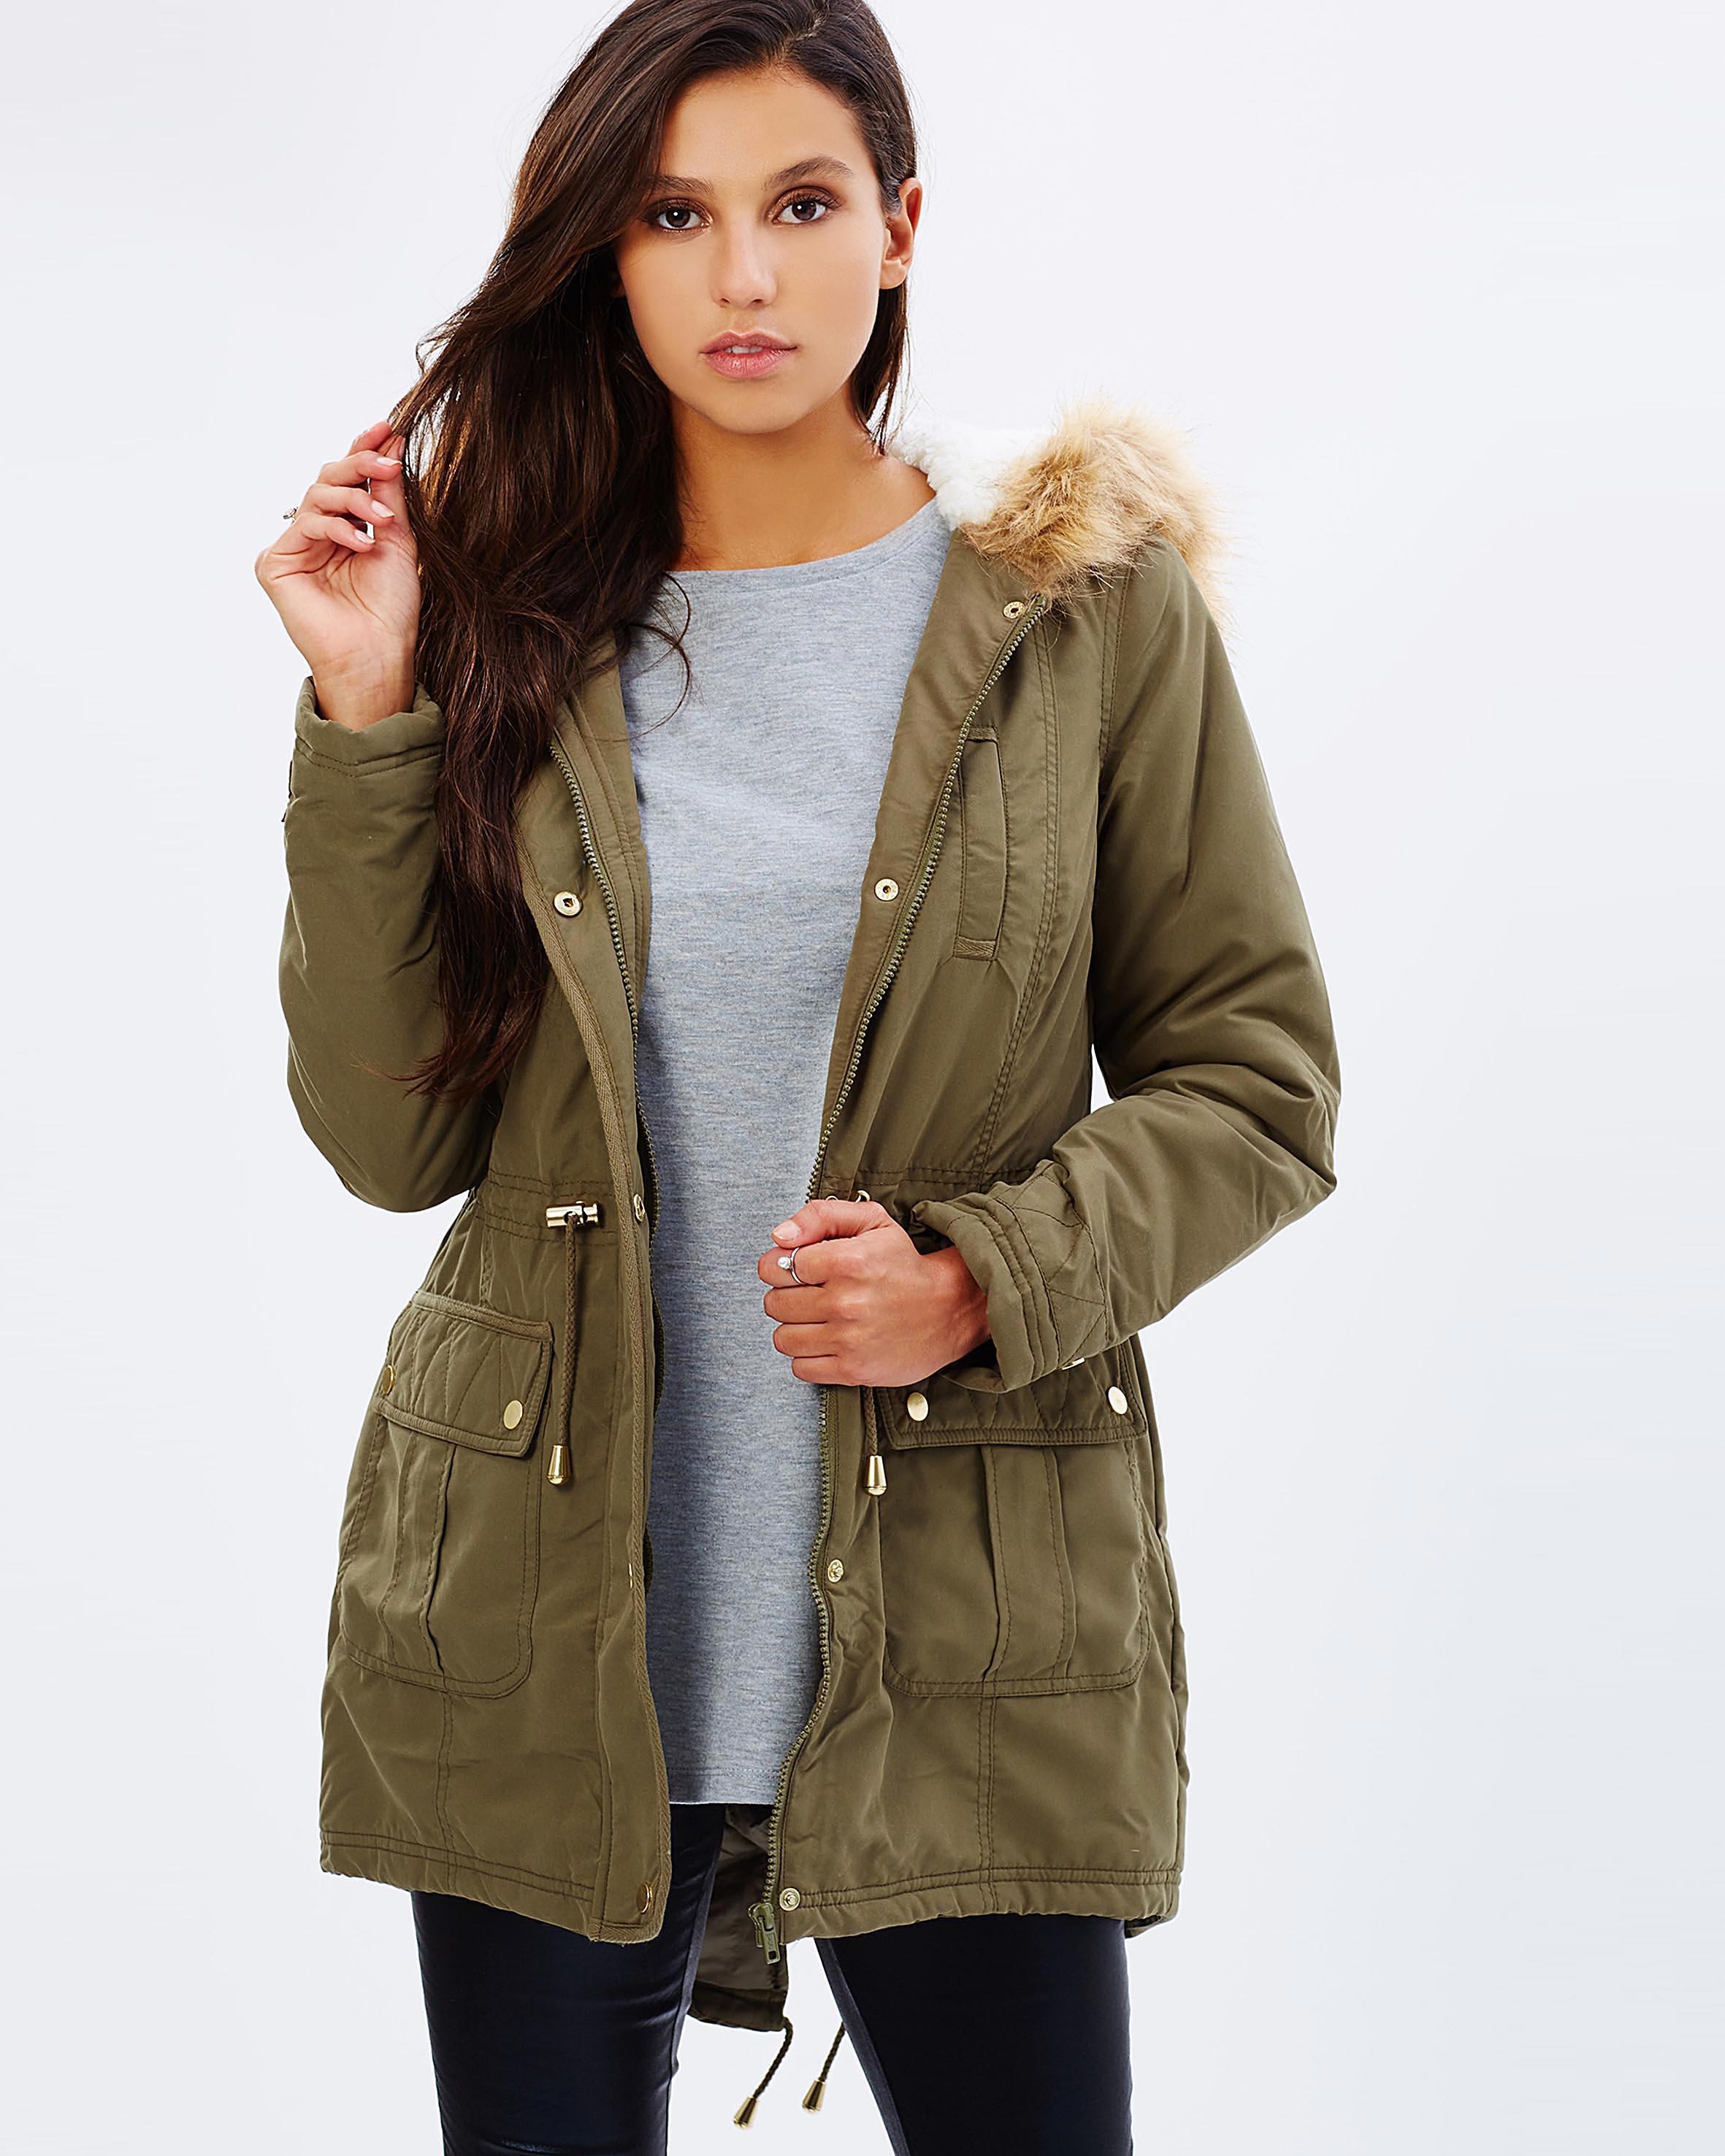 Buy online jeans jacket